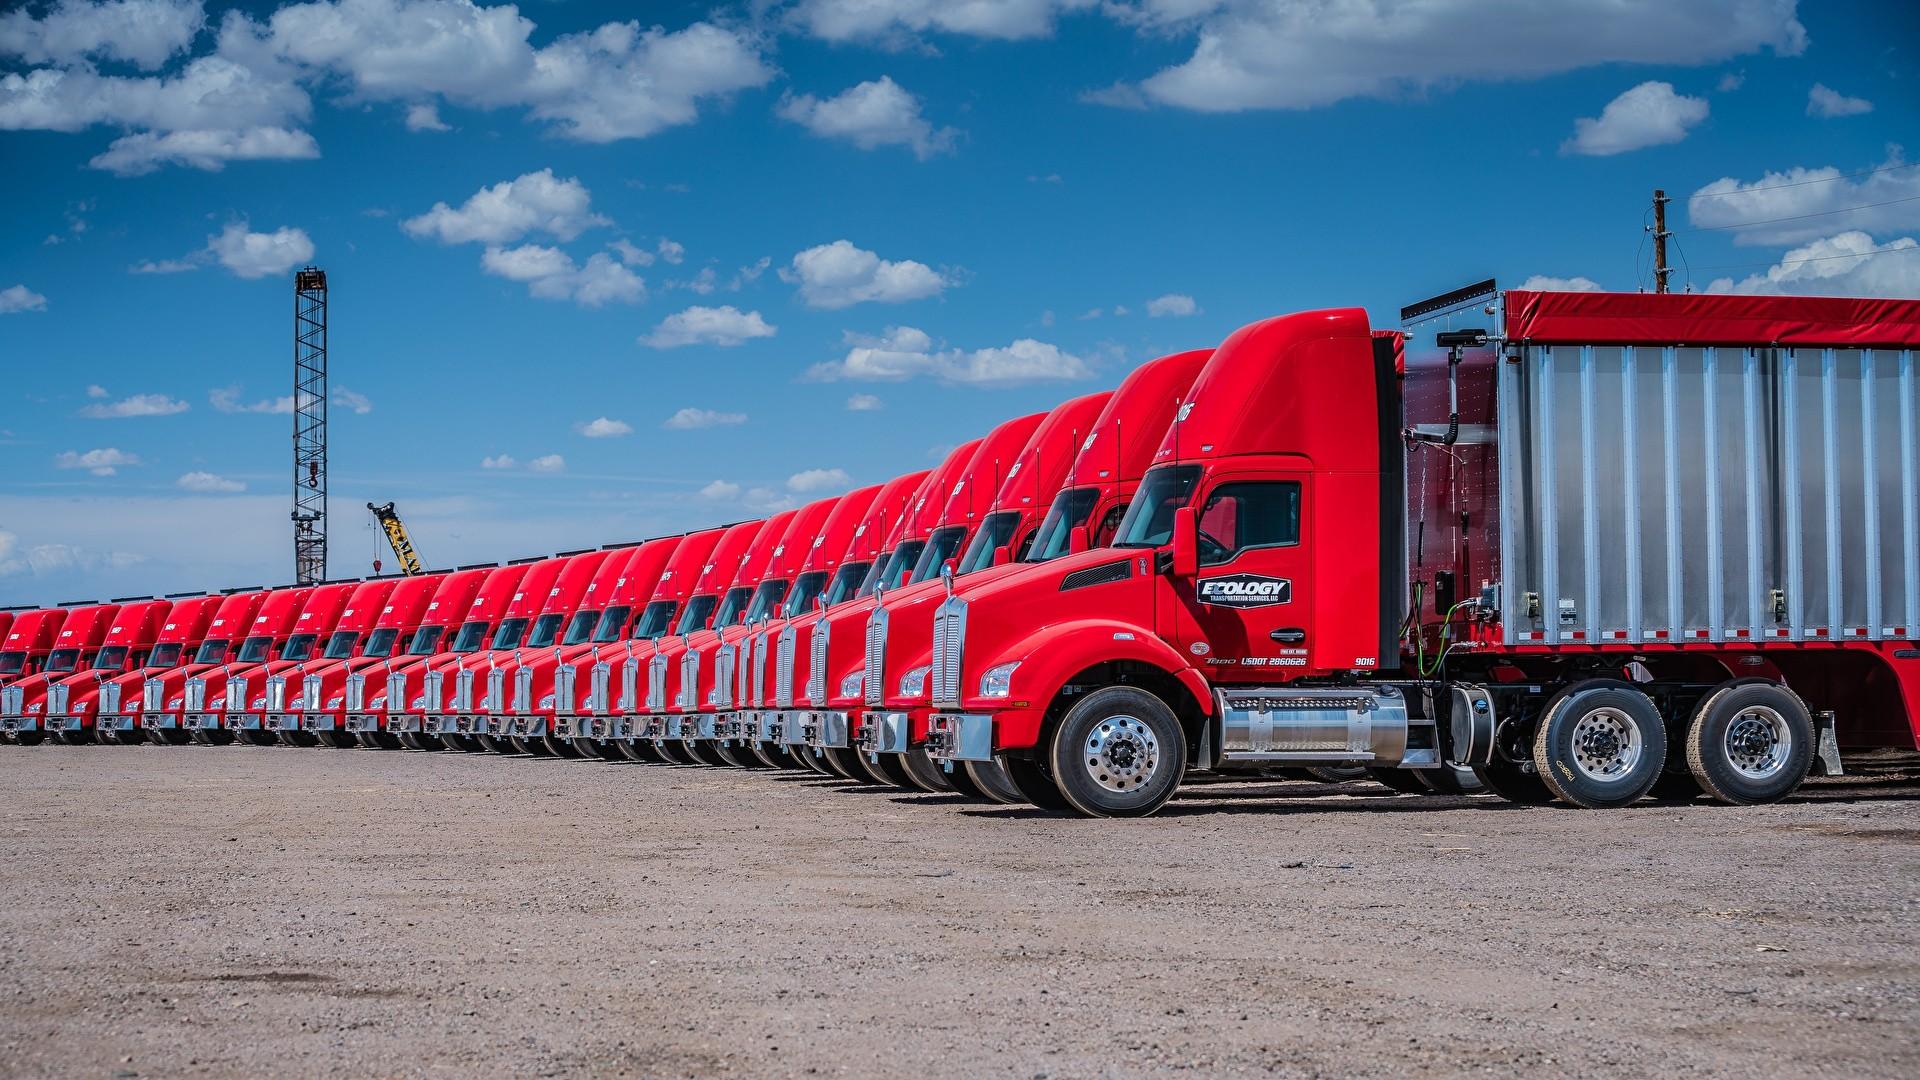 Truck HD Wallpaper